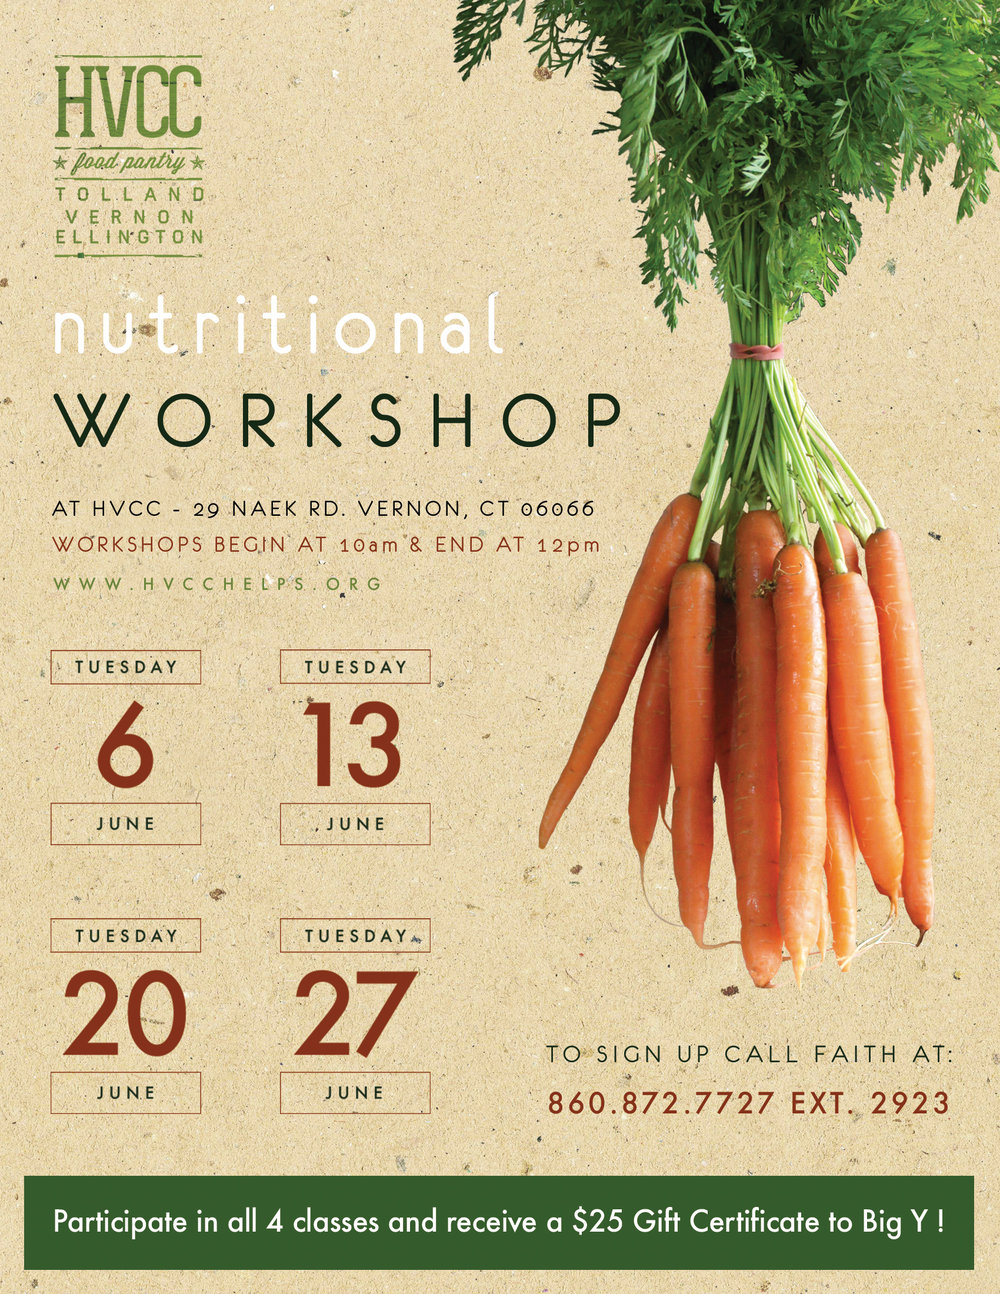 Community Workshop Promotion • Print/Web